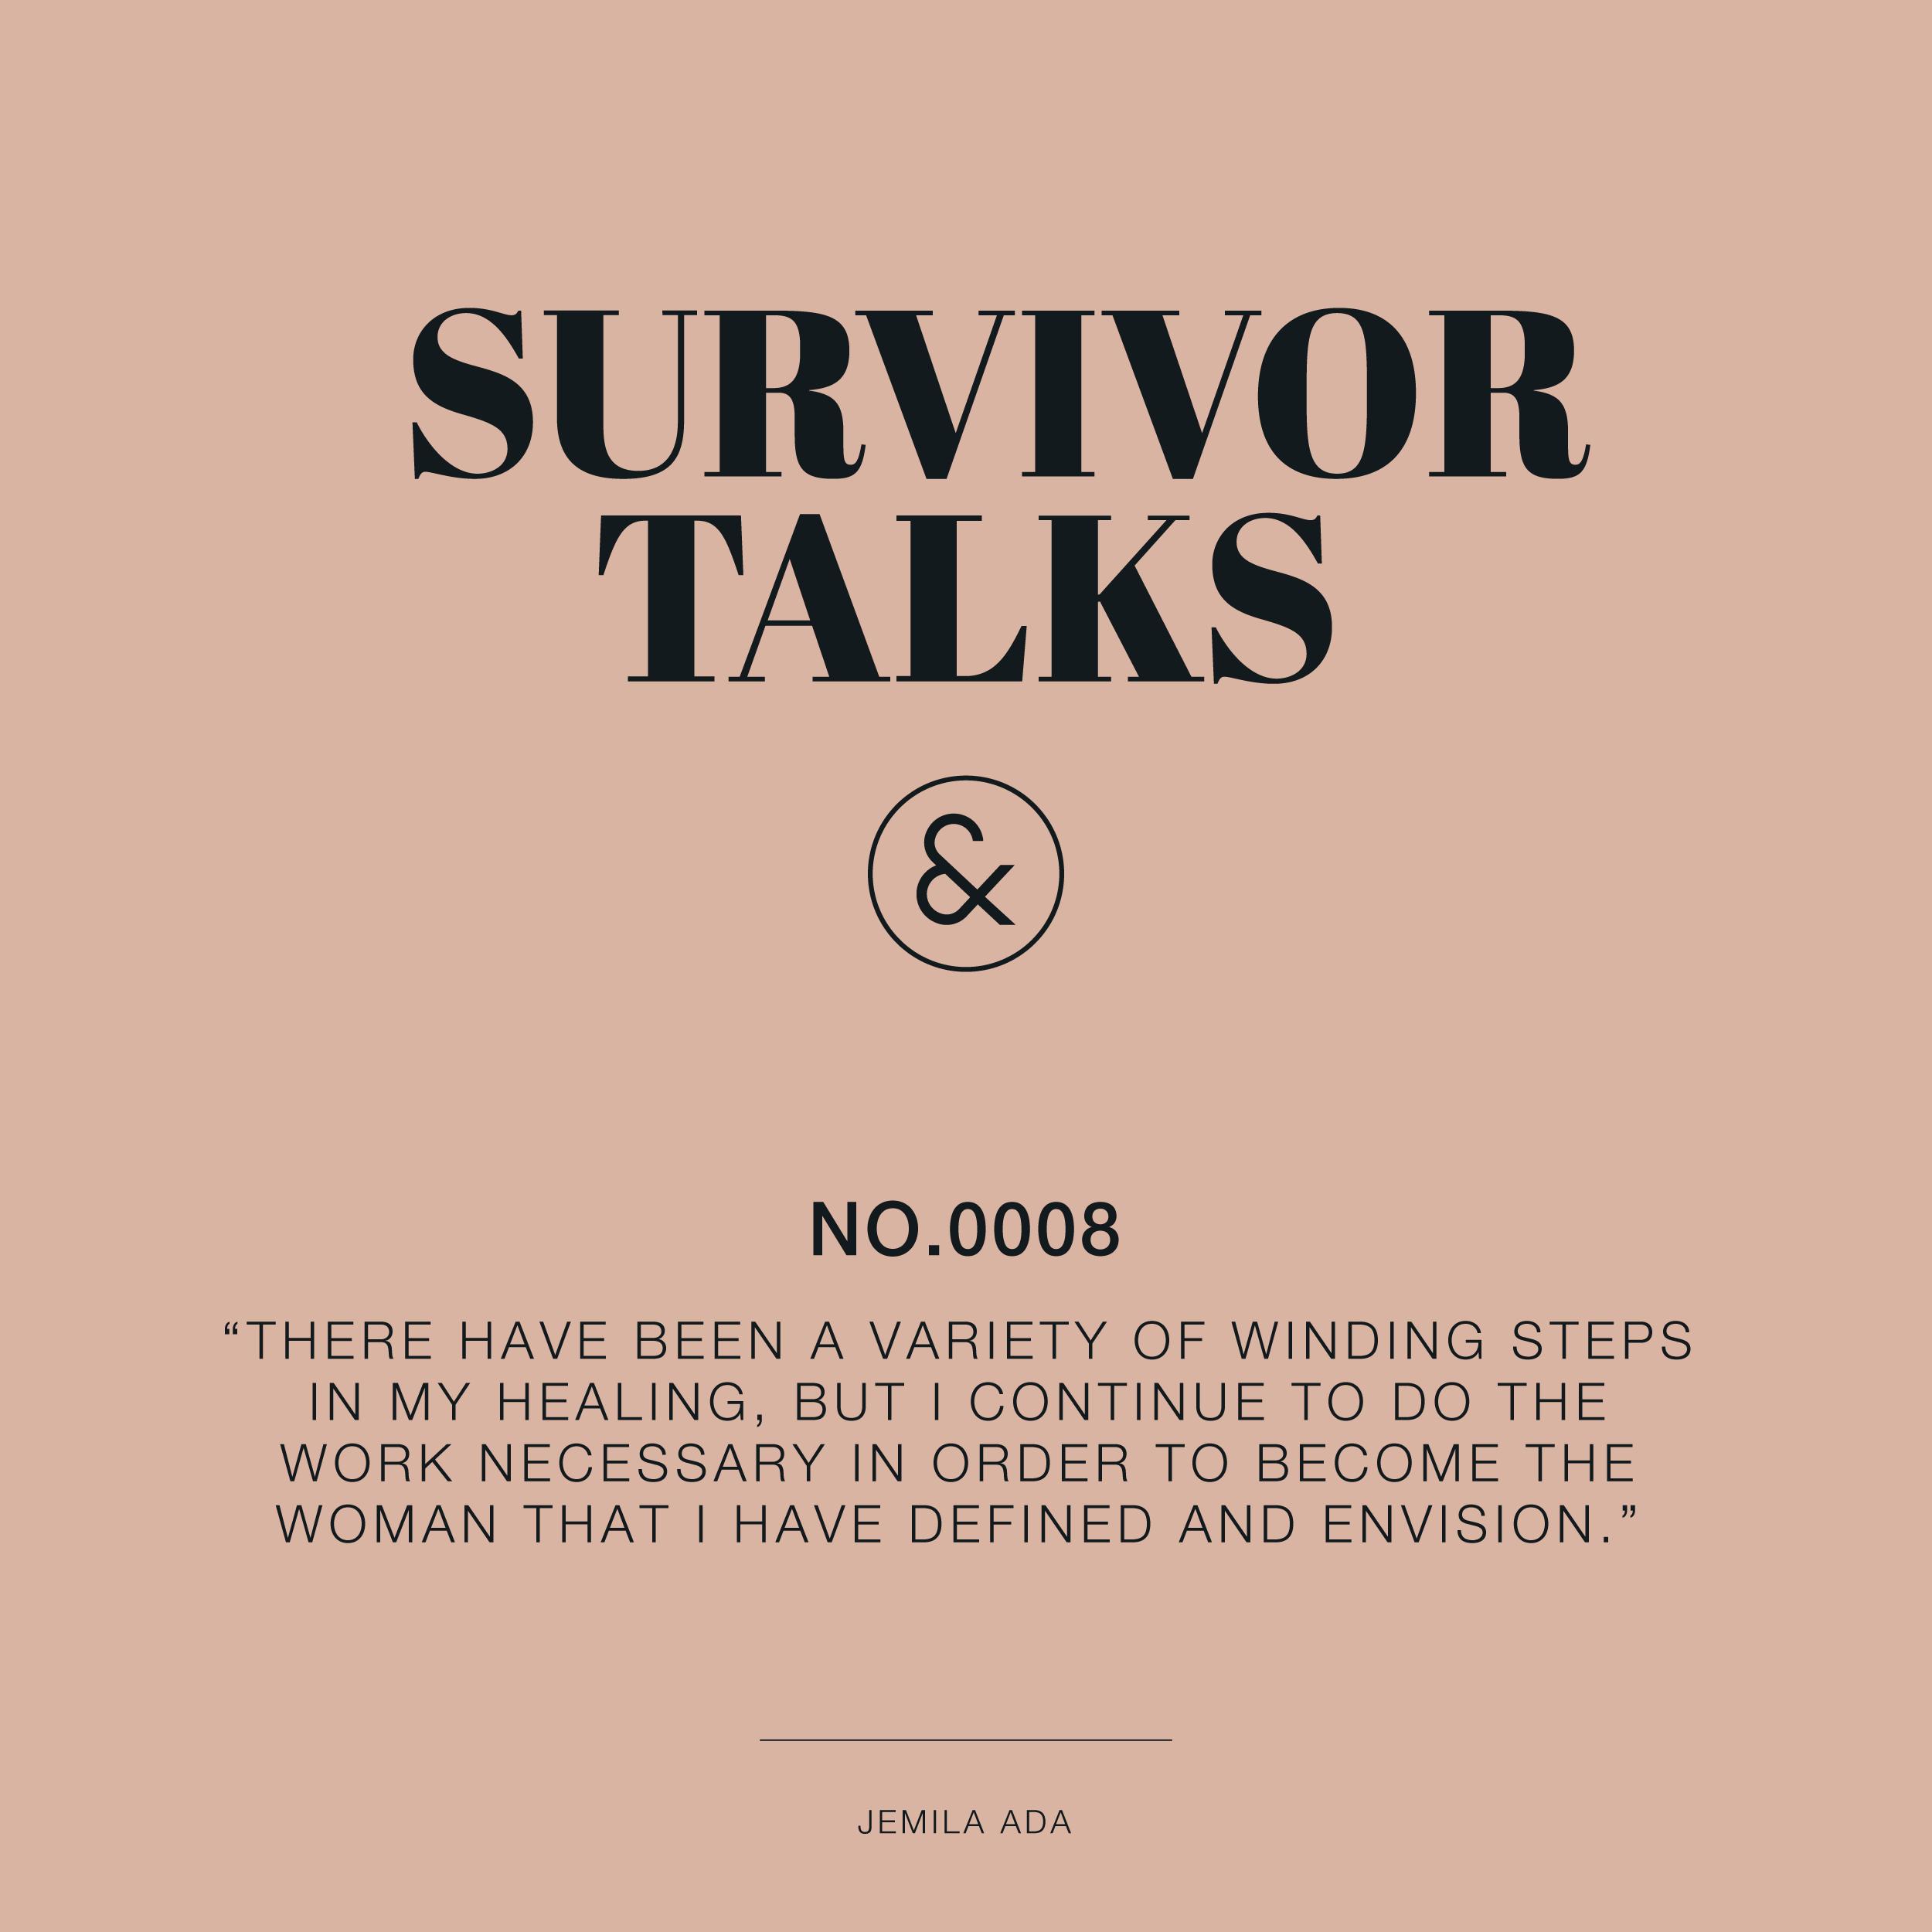 Survivor Talks_0008-65.png